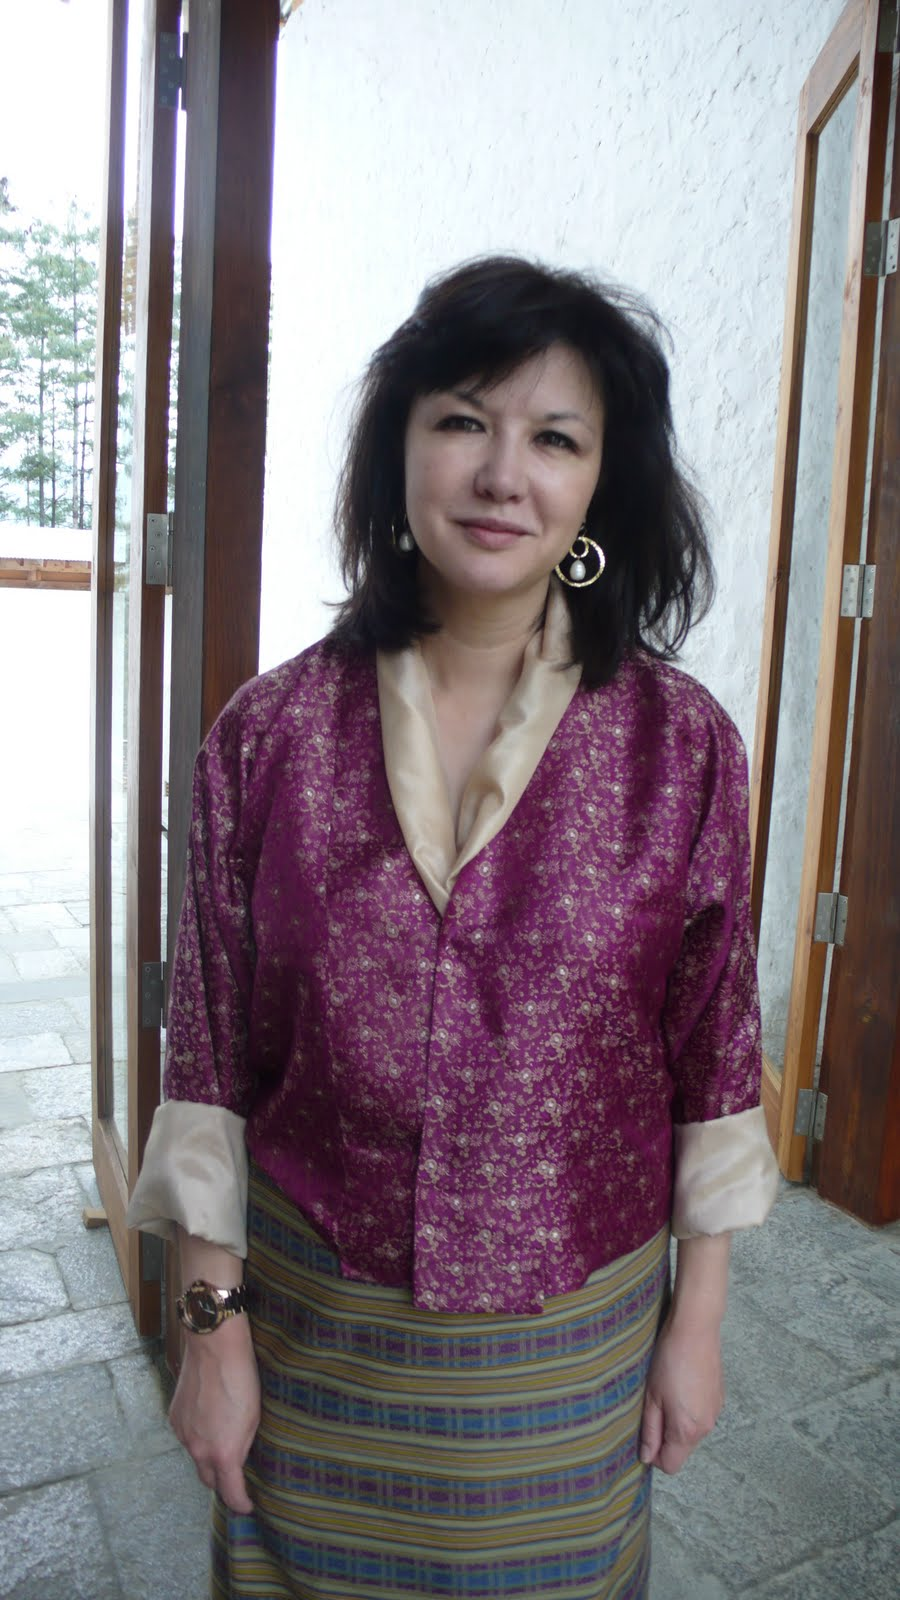 Bhutan sexy girl